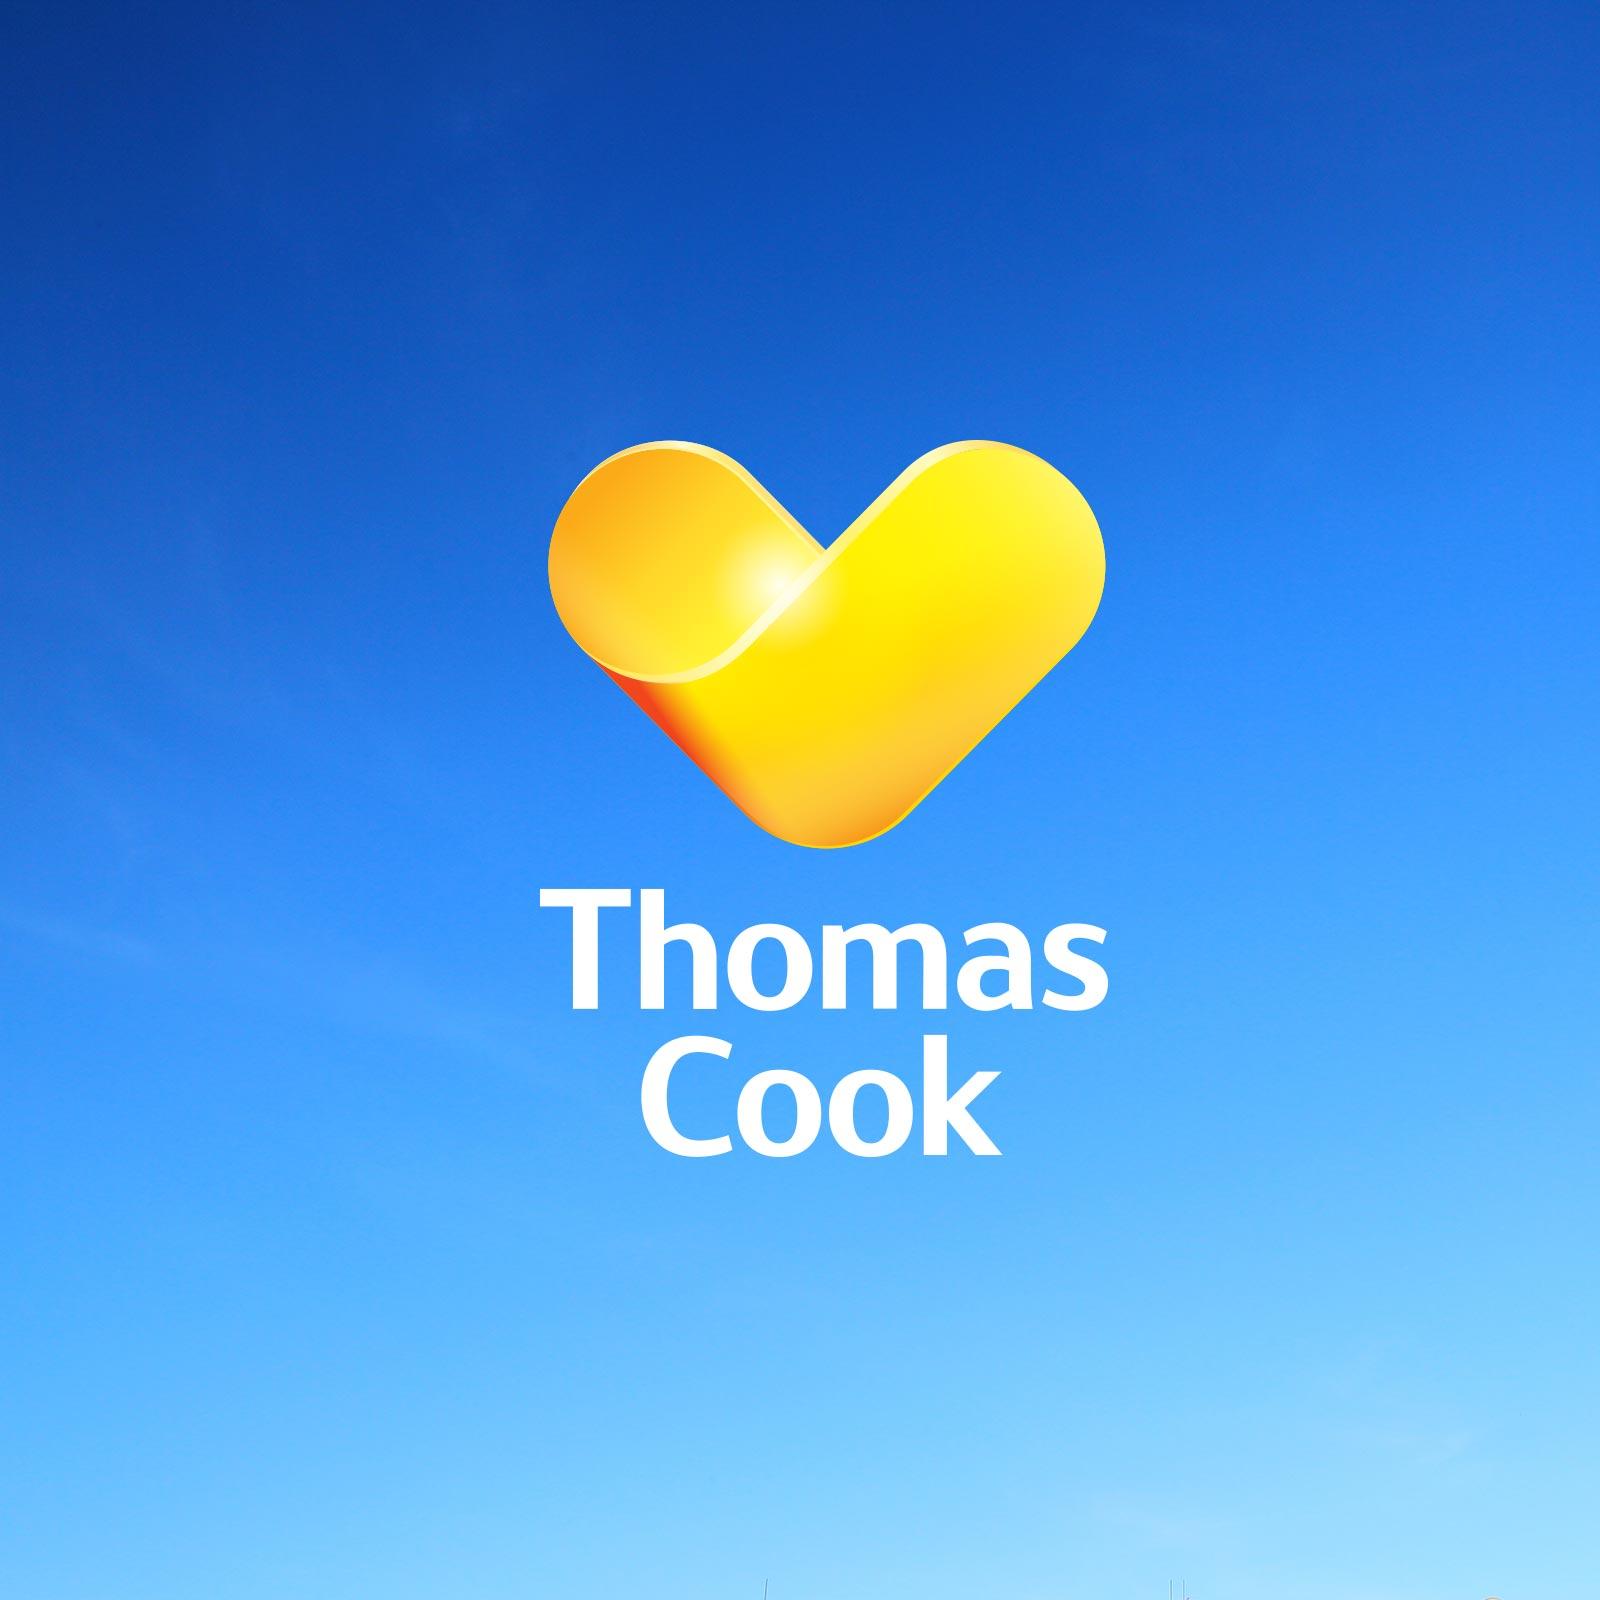 Thomas-cook_logo_V3.jpg